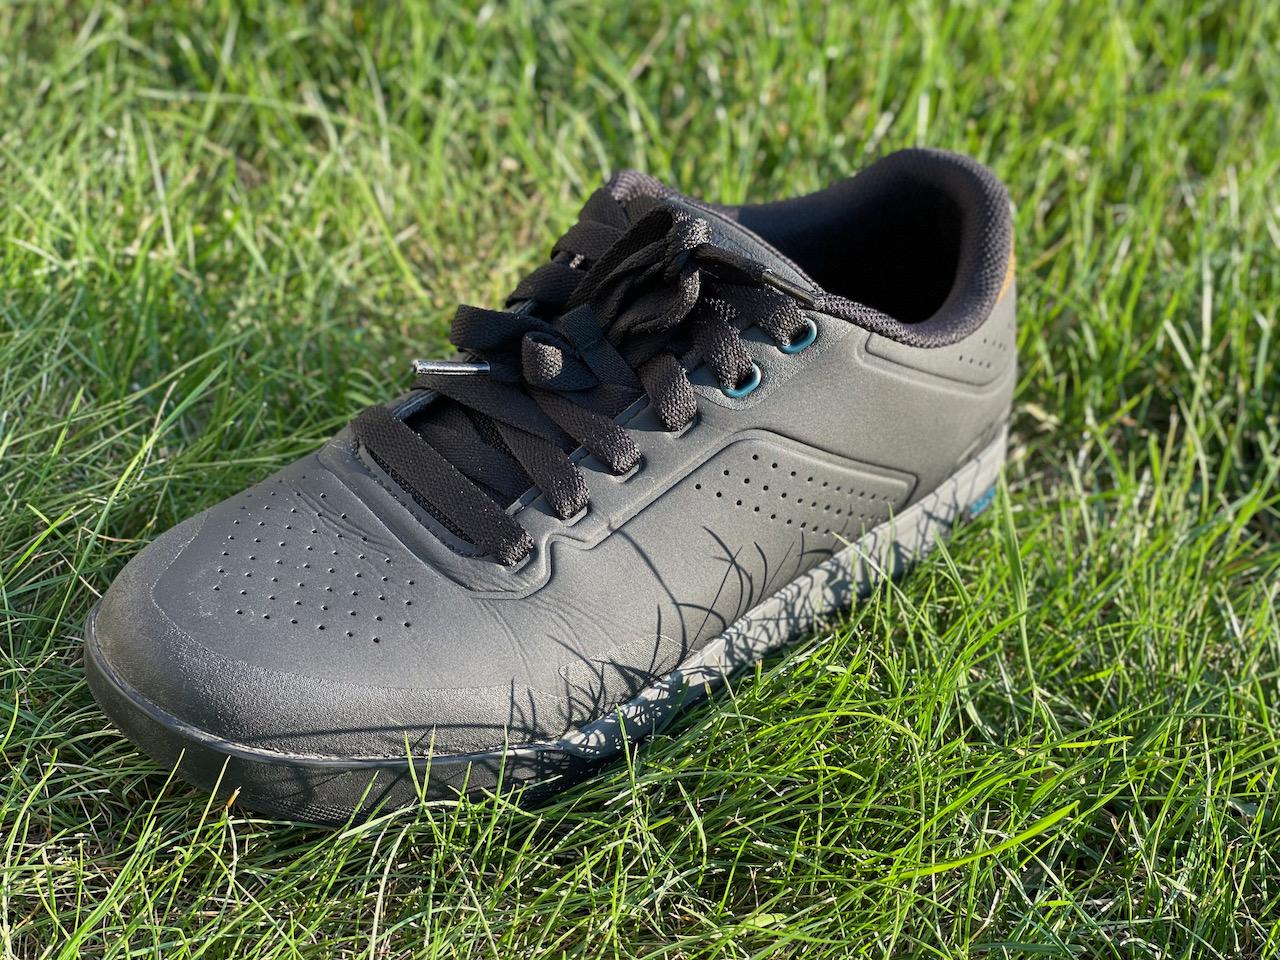 Giro Latch MTB shoes close up